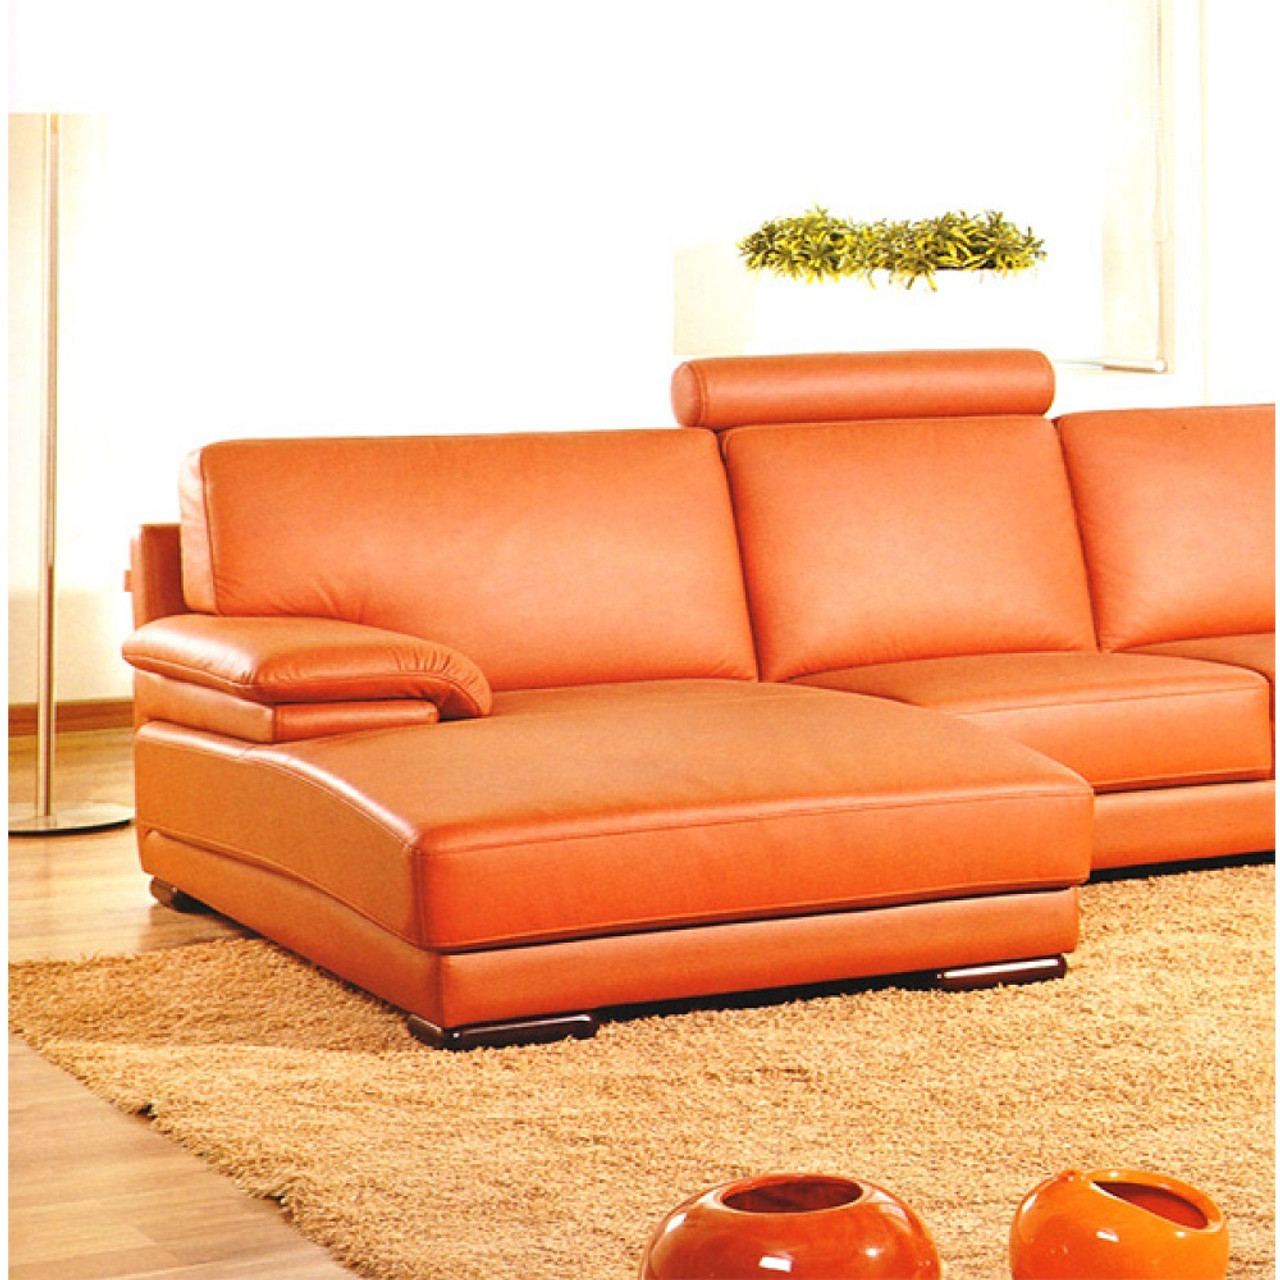 modern leather sectional sofas. Divani Casa 2227 - Modern Leather Sectional Sofa Sofas